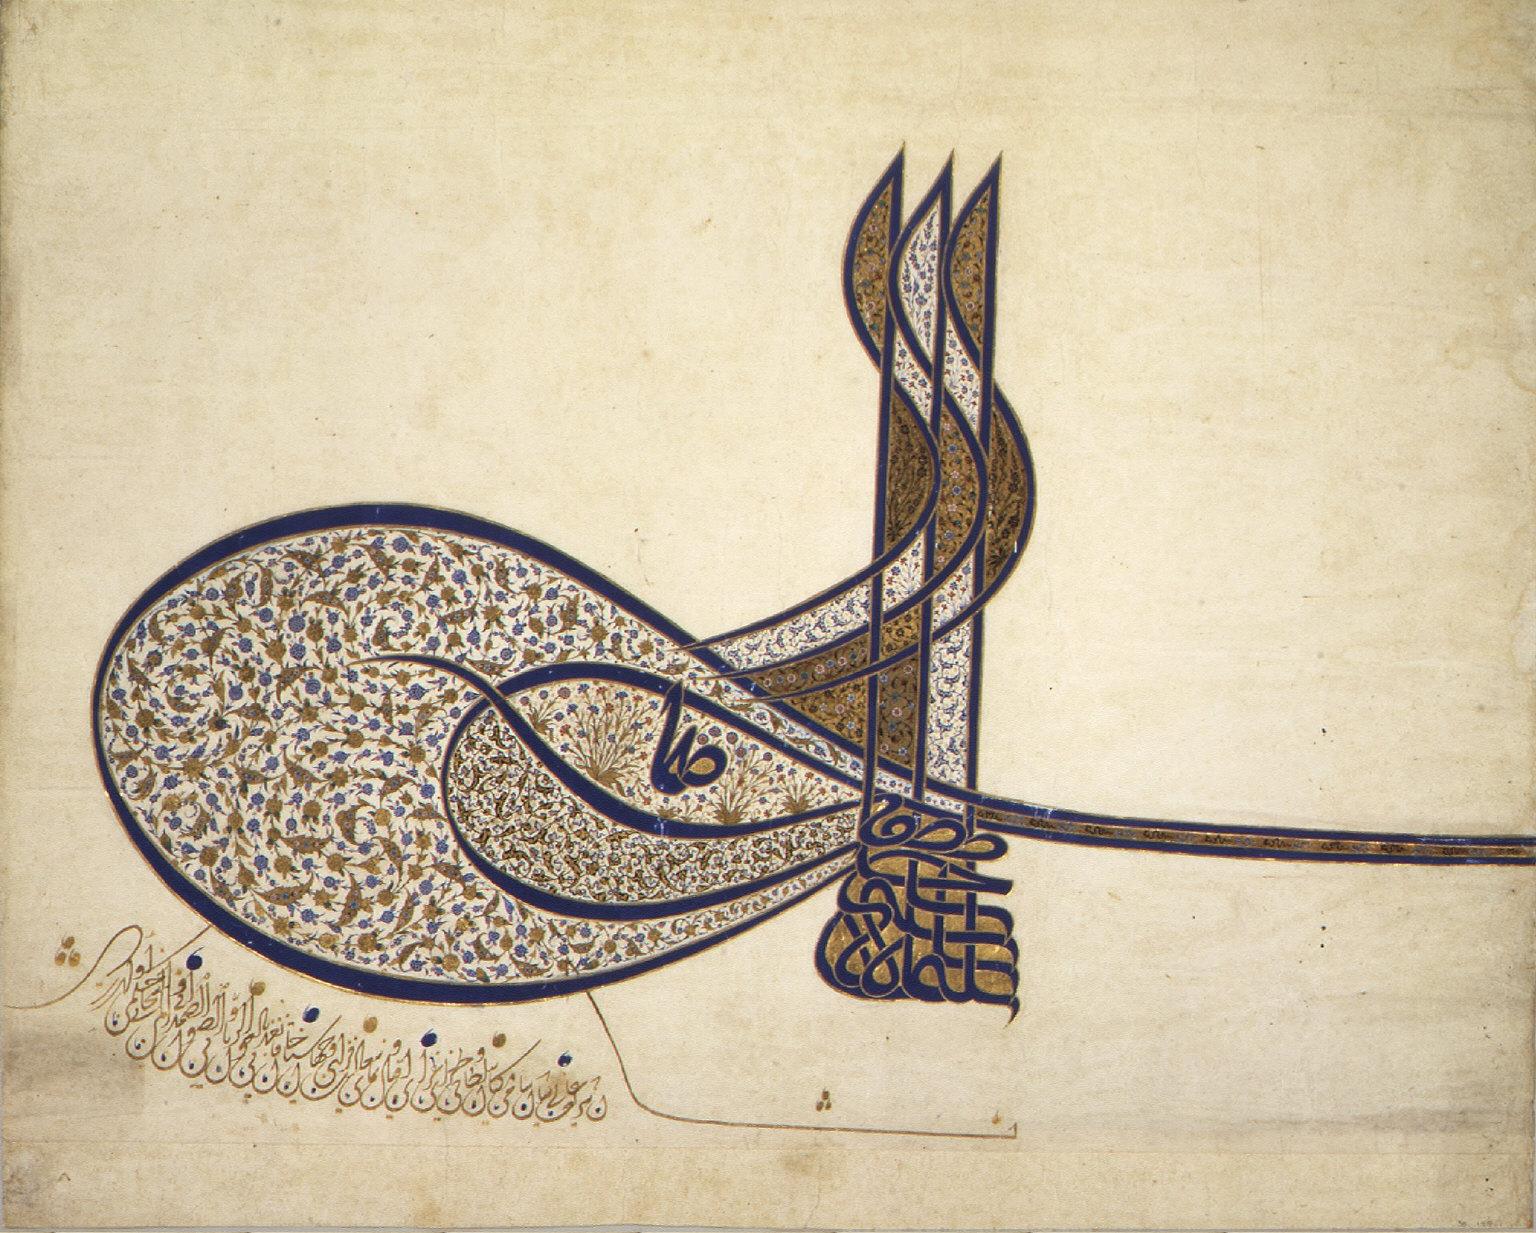 Tughra of Sultan Suleiman the Magnificent (r. 1520-66)